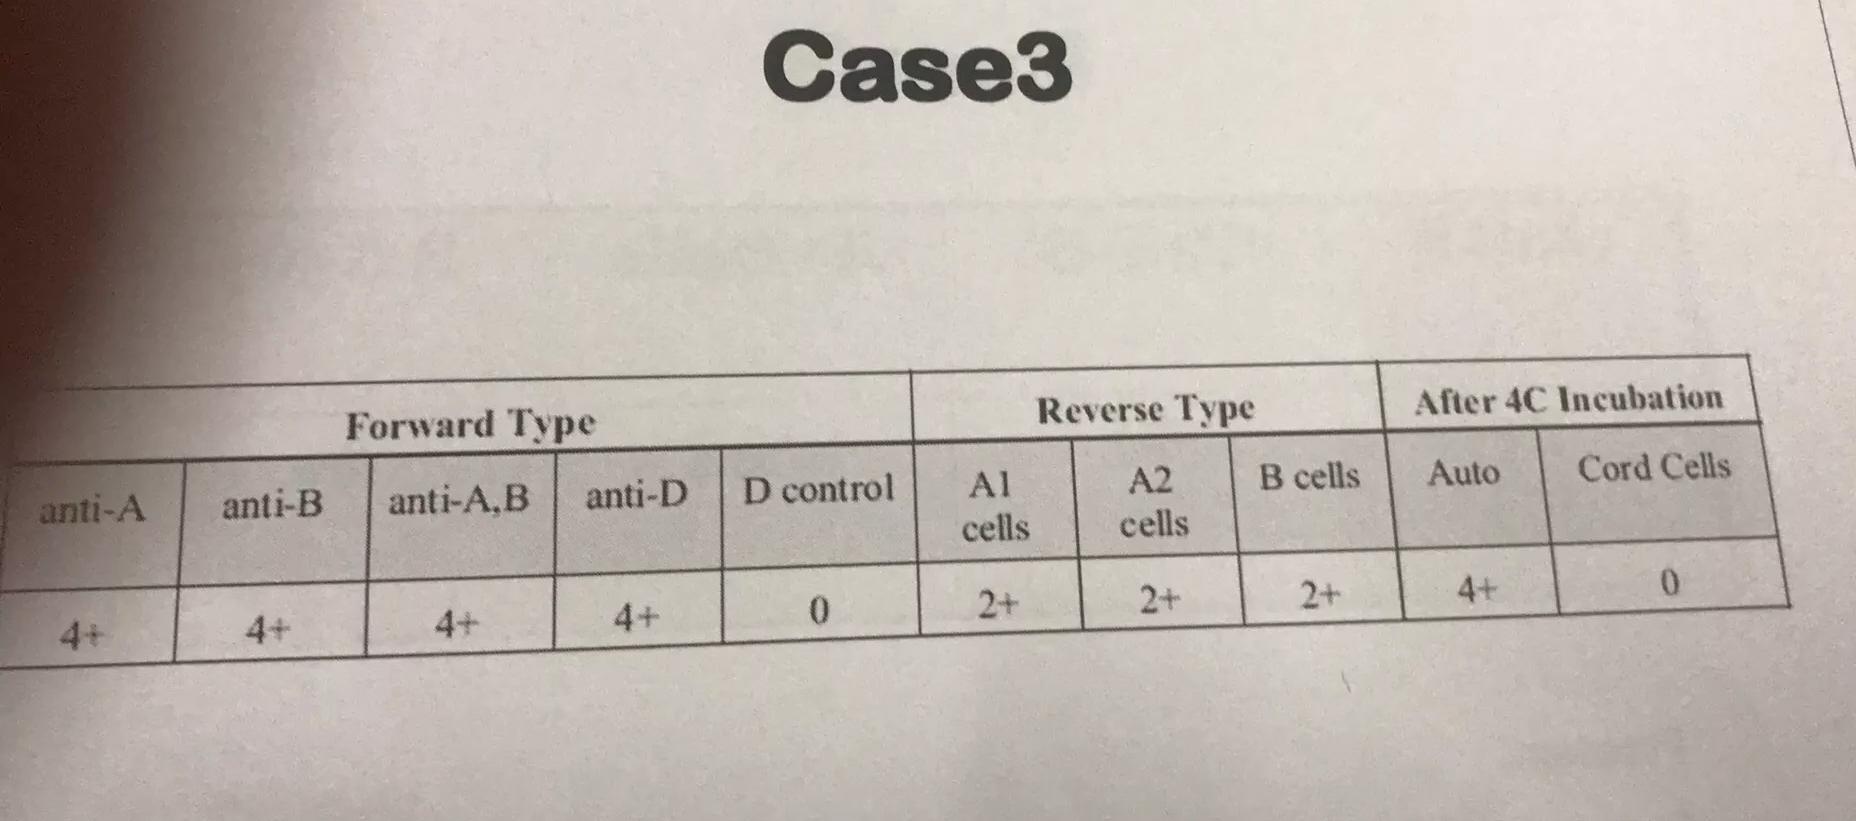 Case3 Reverse Type After 4C Incubation Forward Type Auto B cells Cord Cells anti-D anti-B D control anti-A.B anti-A Al cells